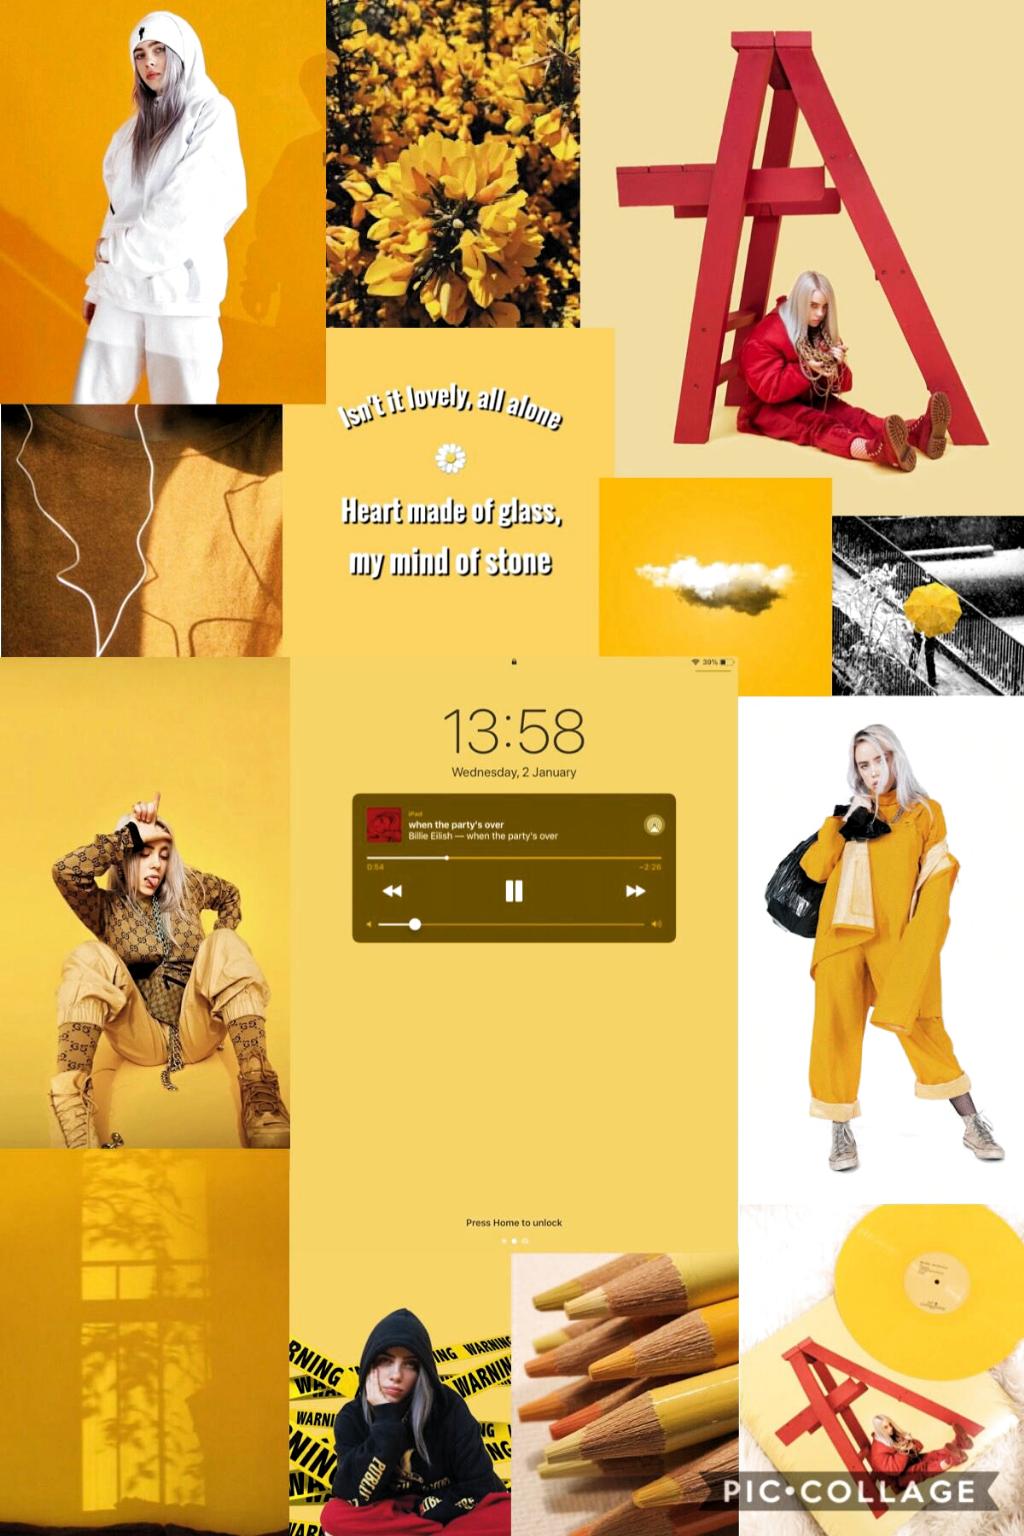 Billie Eilish Collage Busqueda De Google Billie Billie Eilish Aesthetic Collage